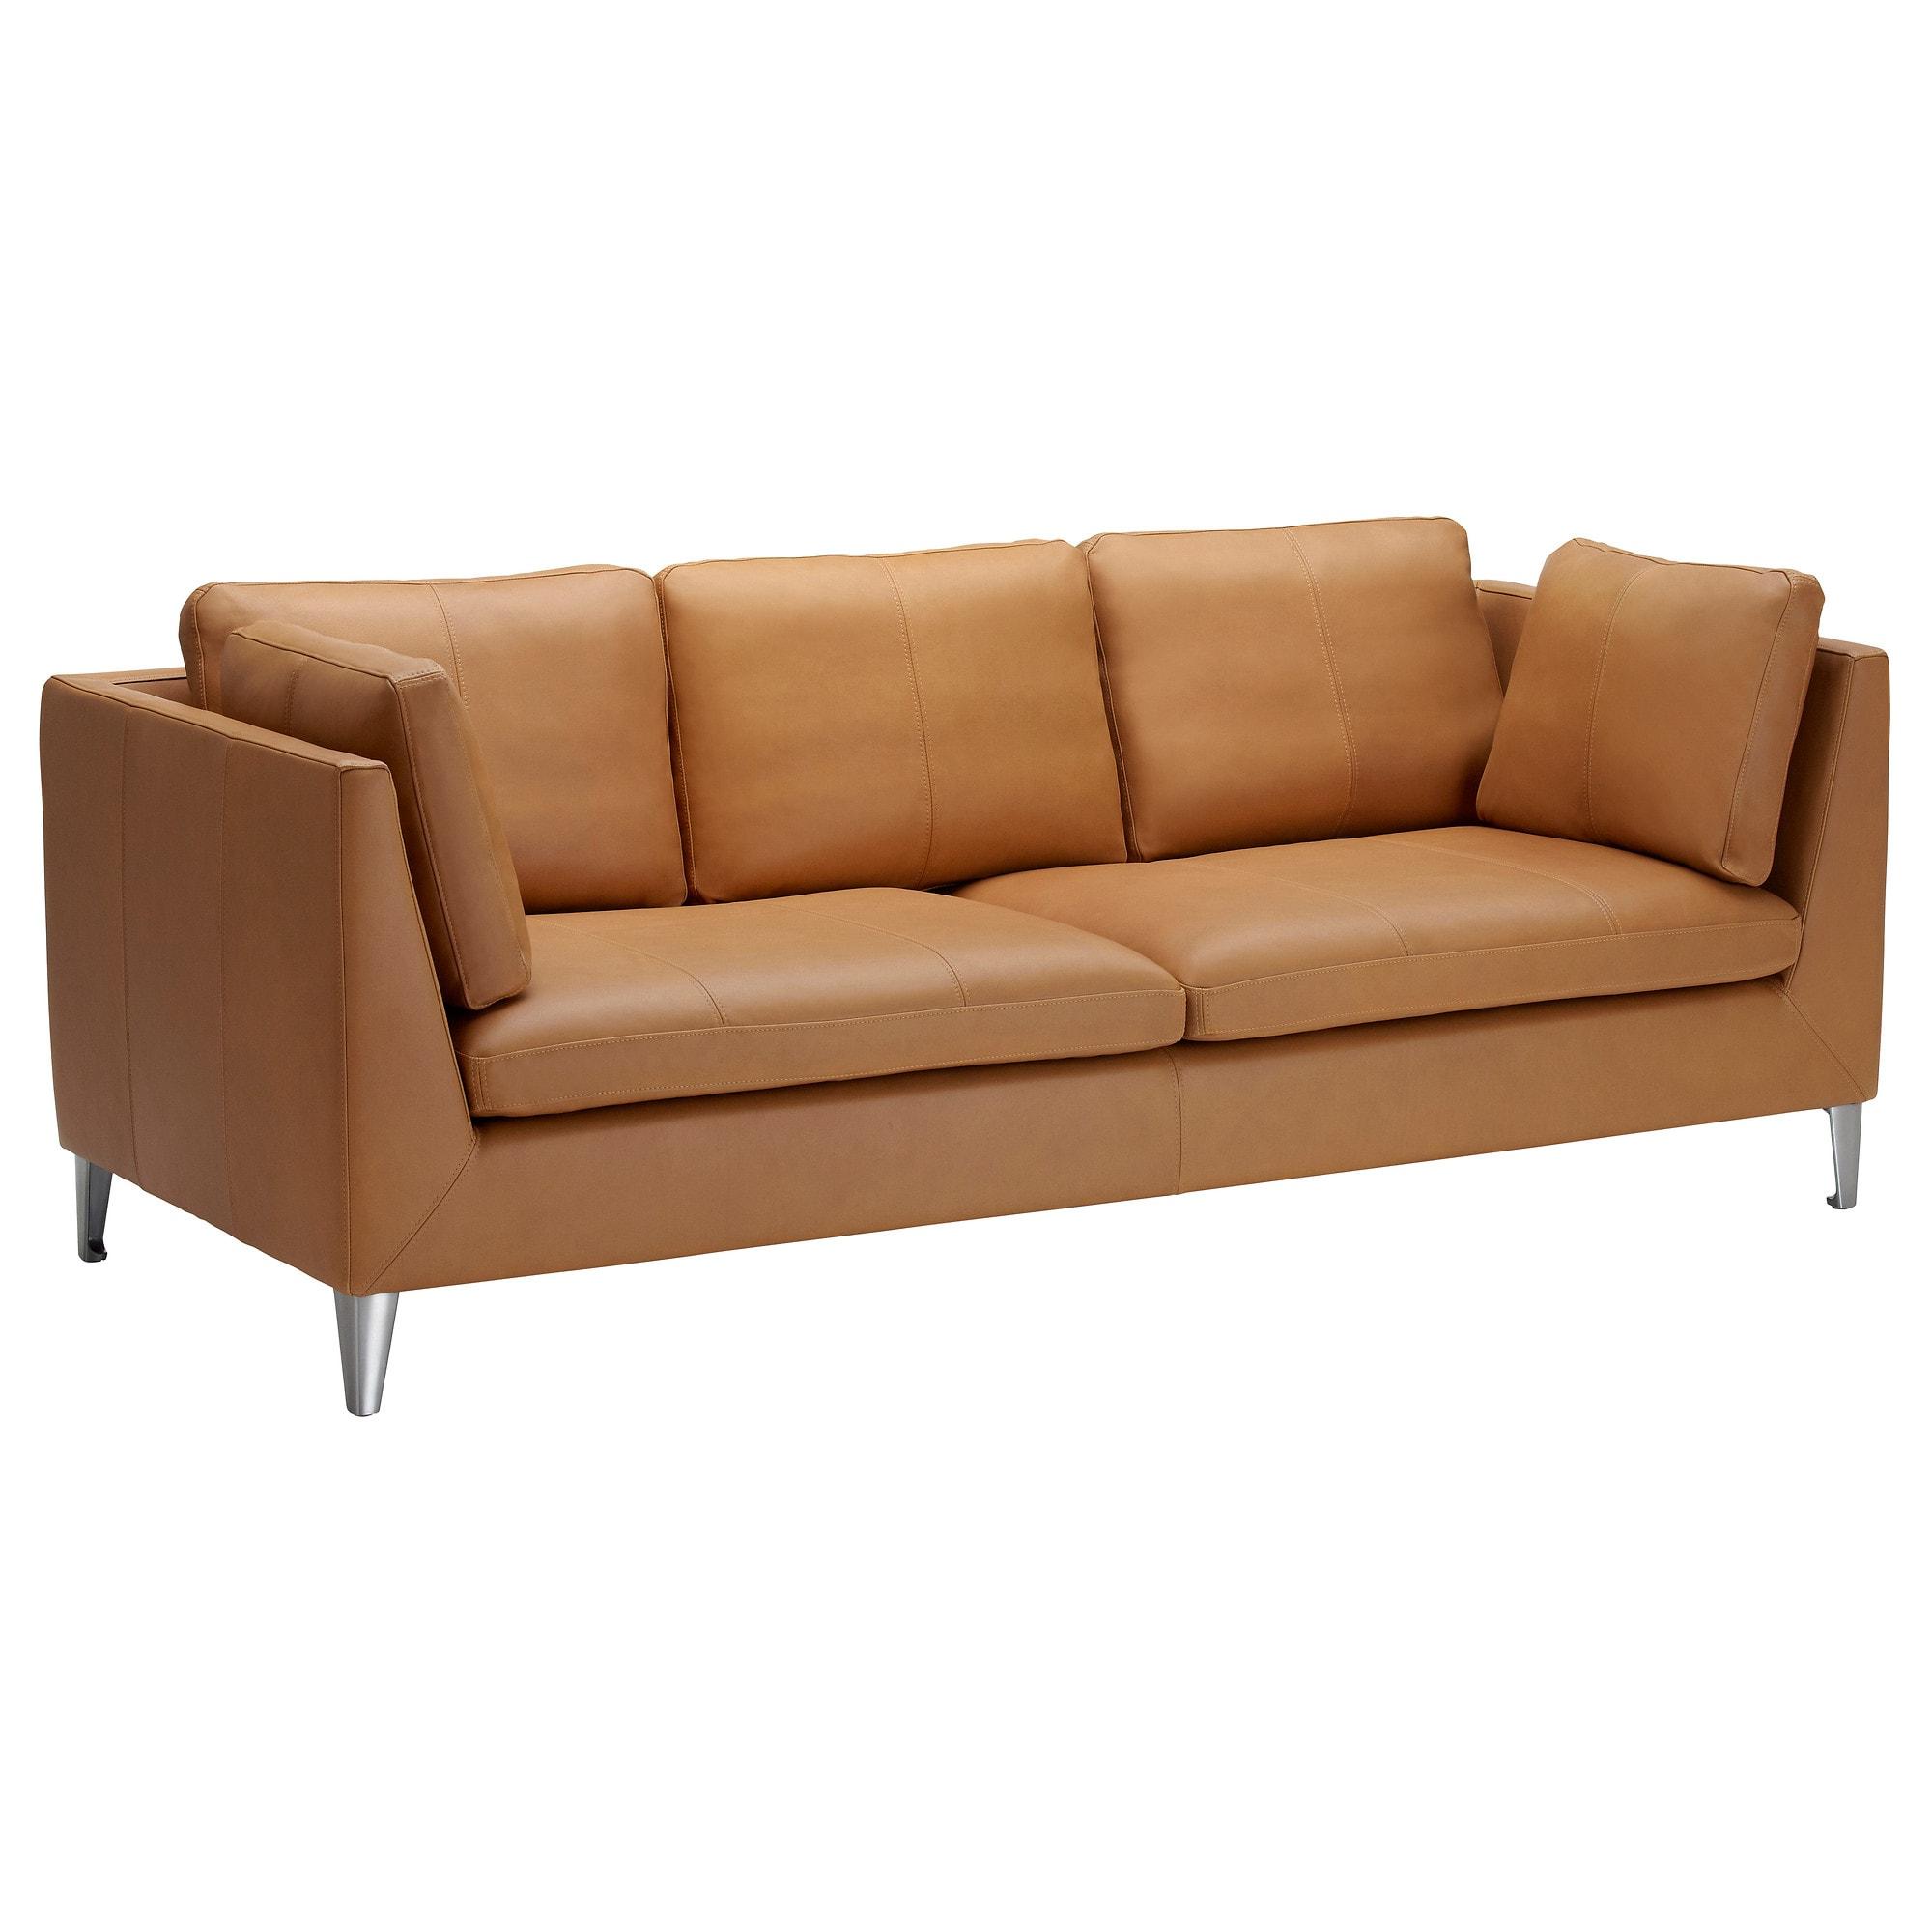 Ikea sofas Piel 3ldq Stockholm sofà 3 Plazas Seglora Natural Ikea